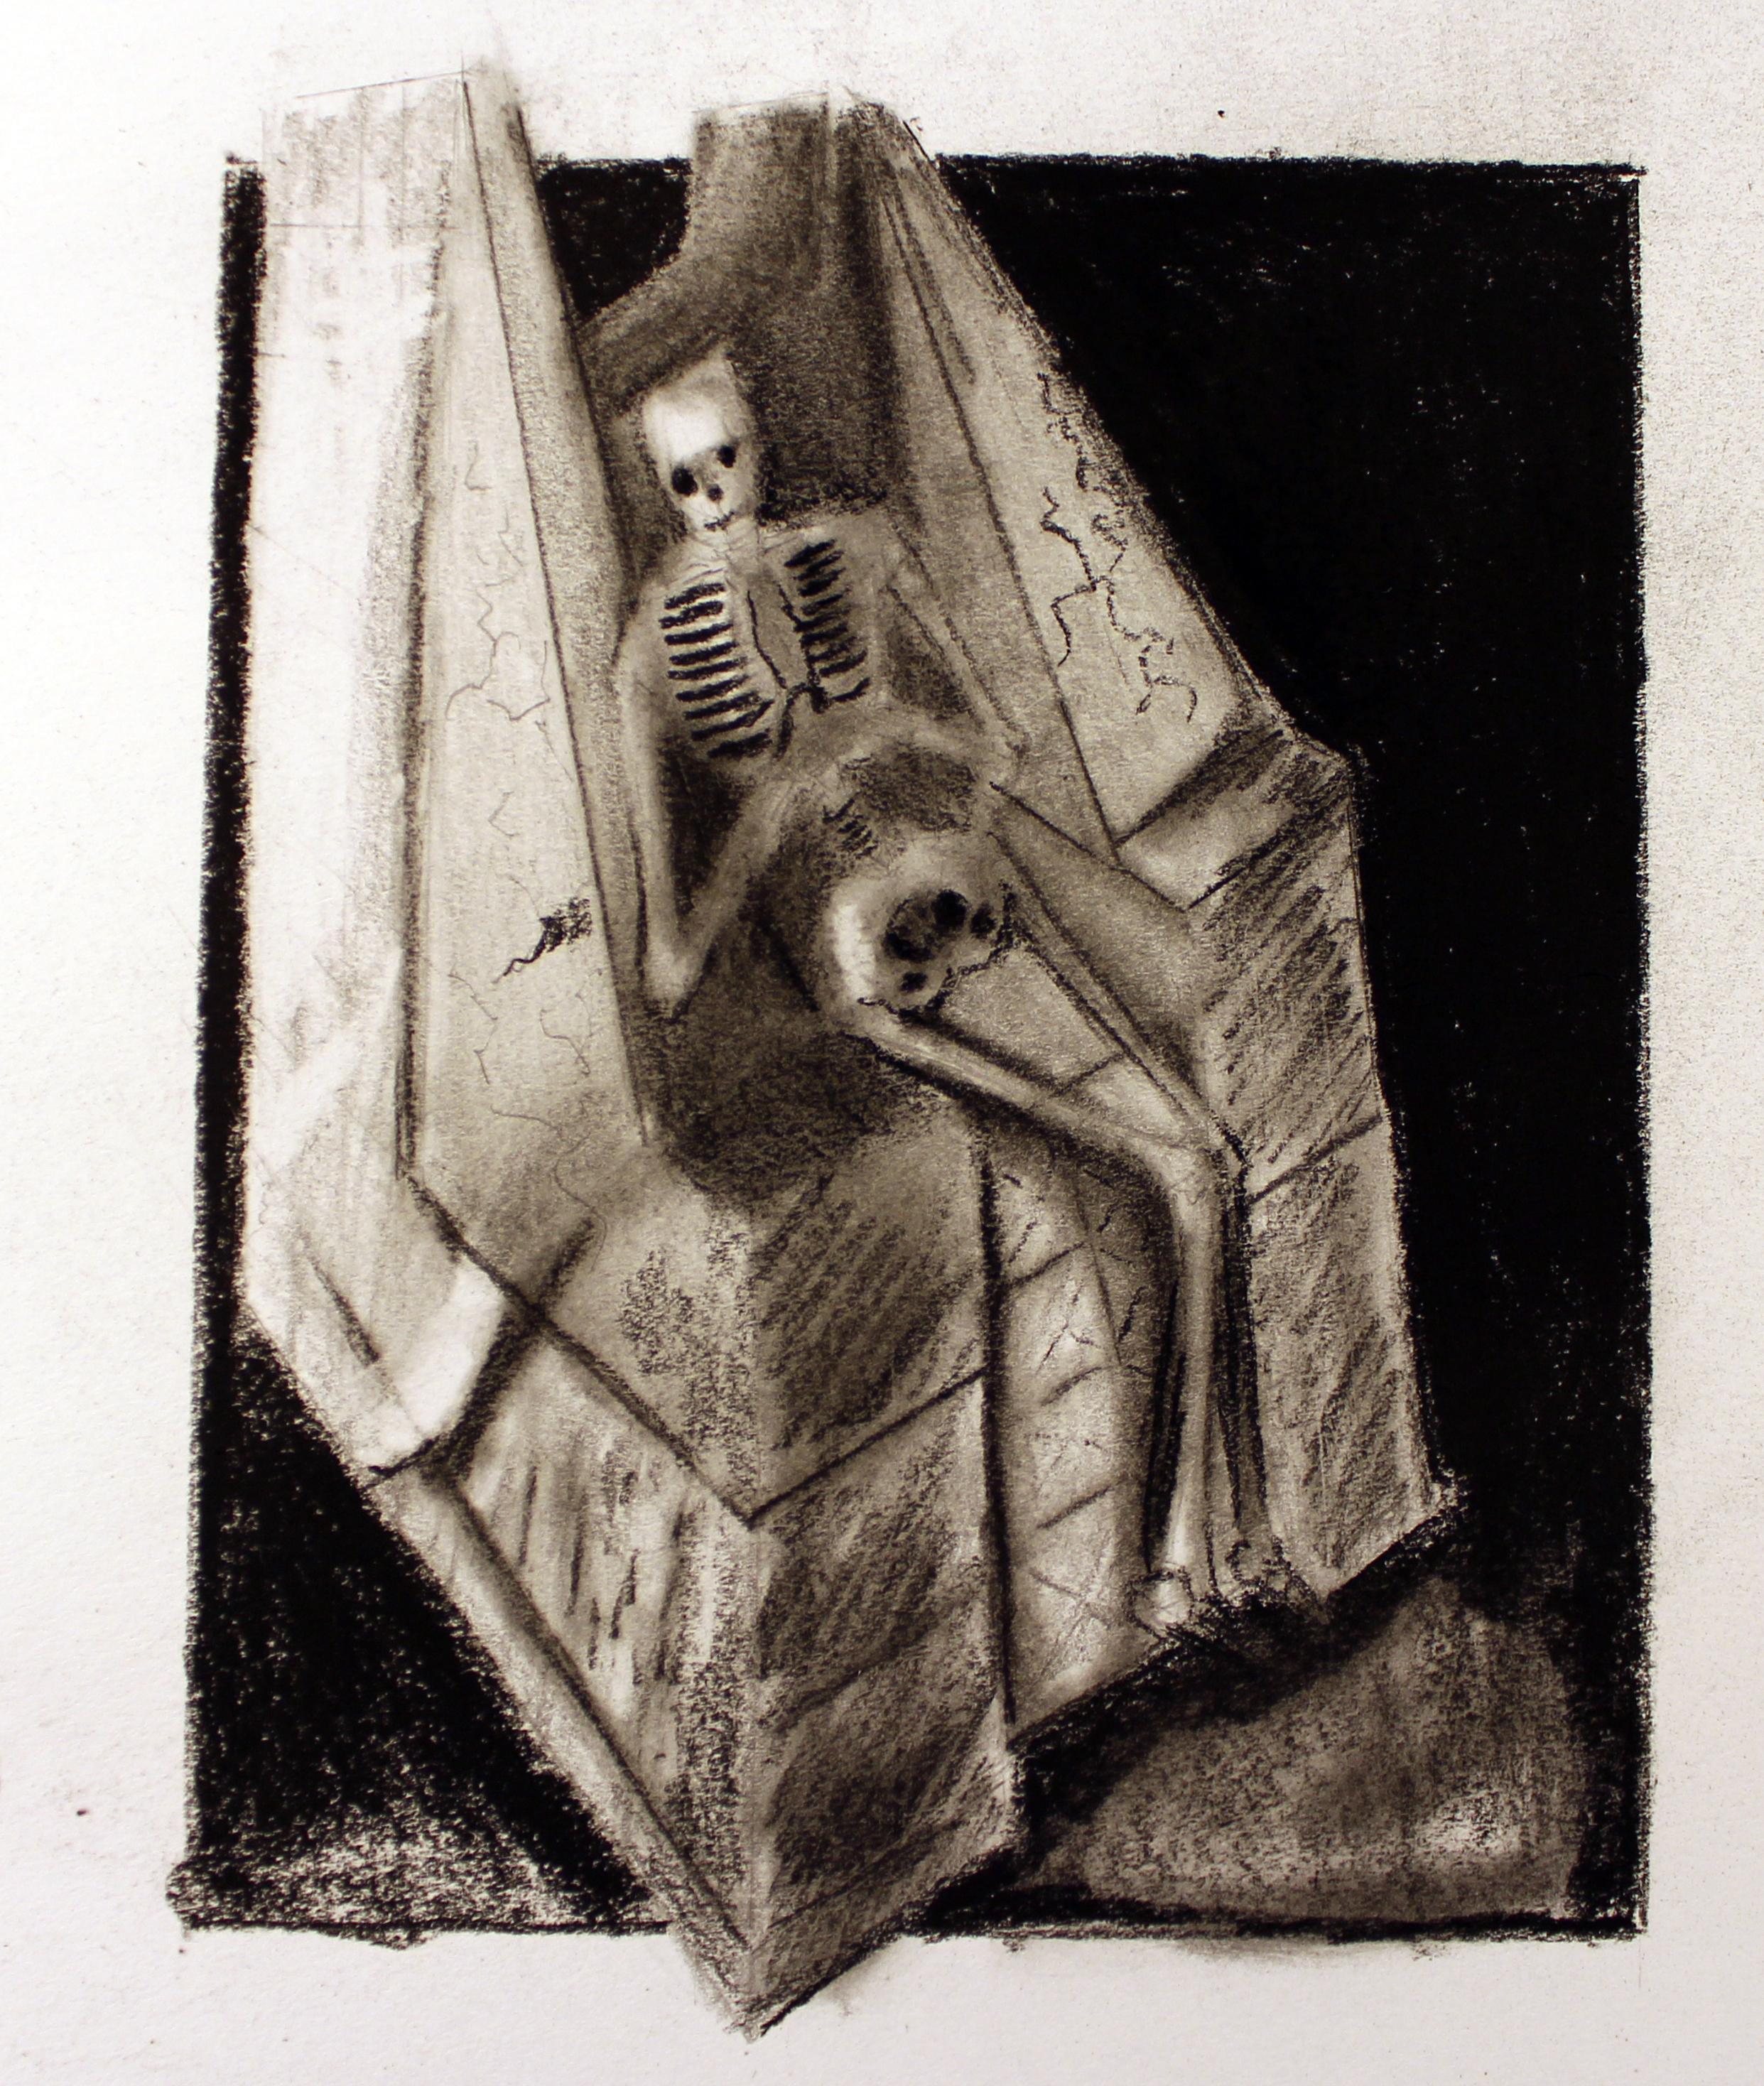 sekeleton in chair